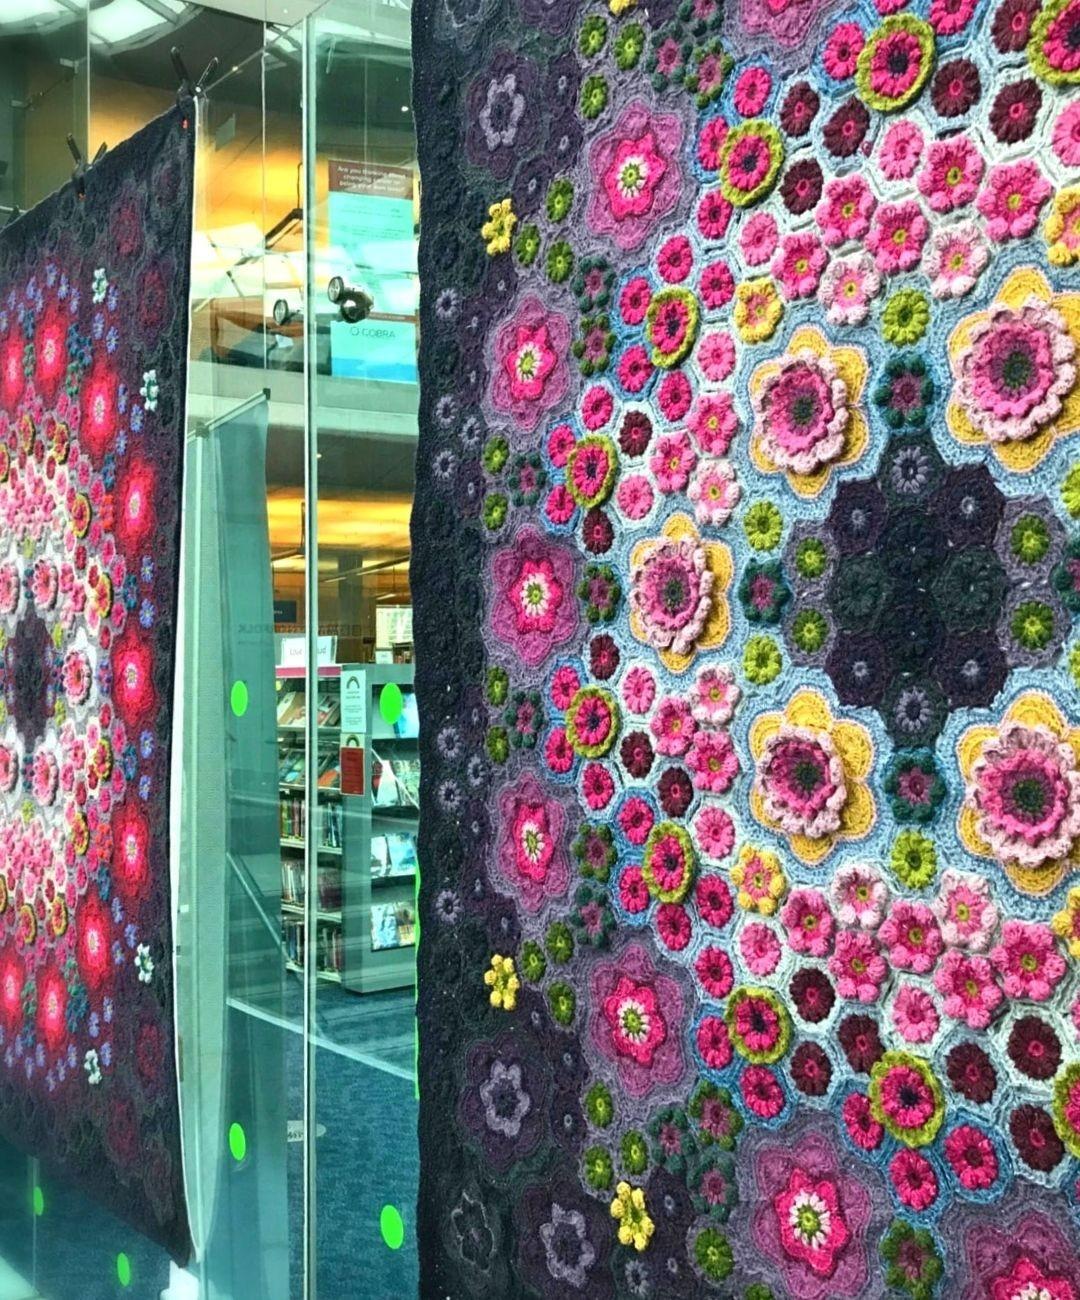 Wallflowers crochet blanket display